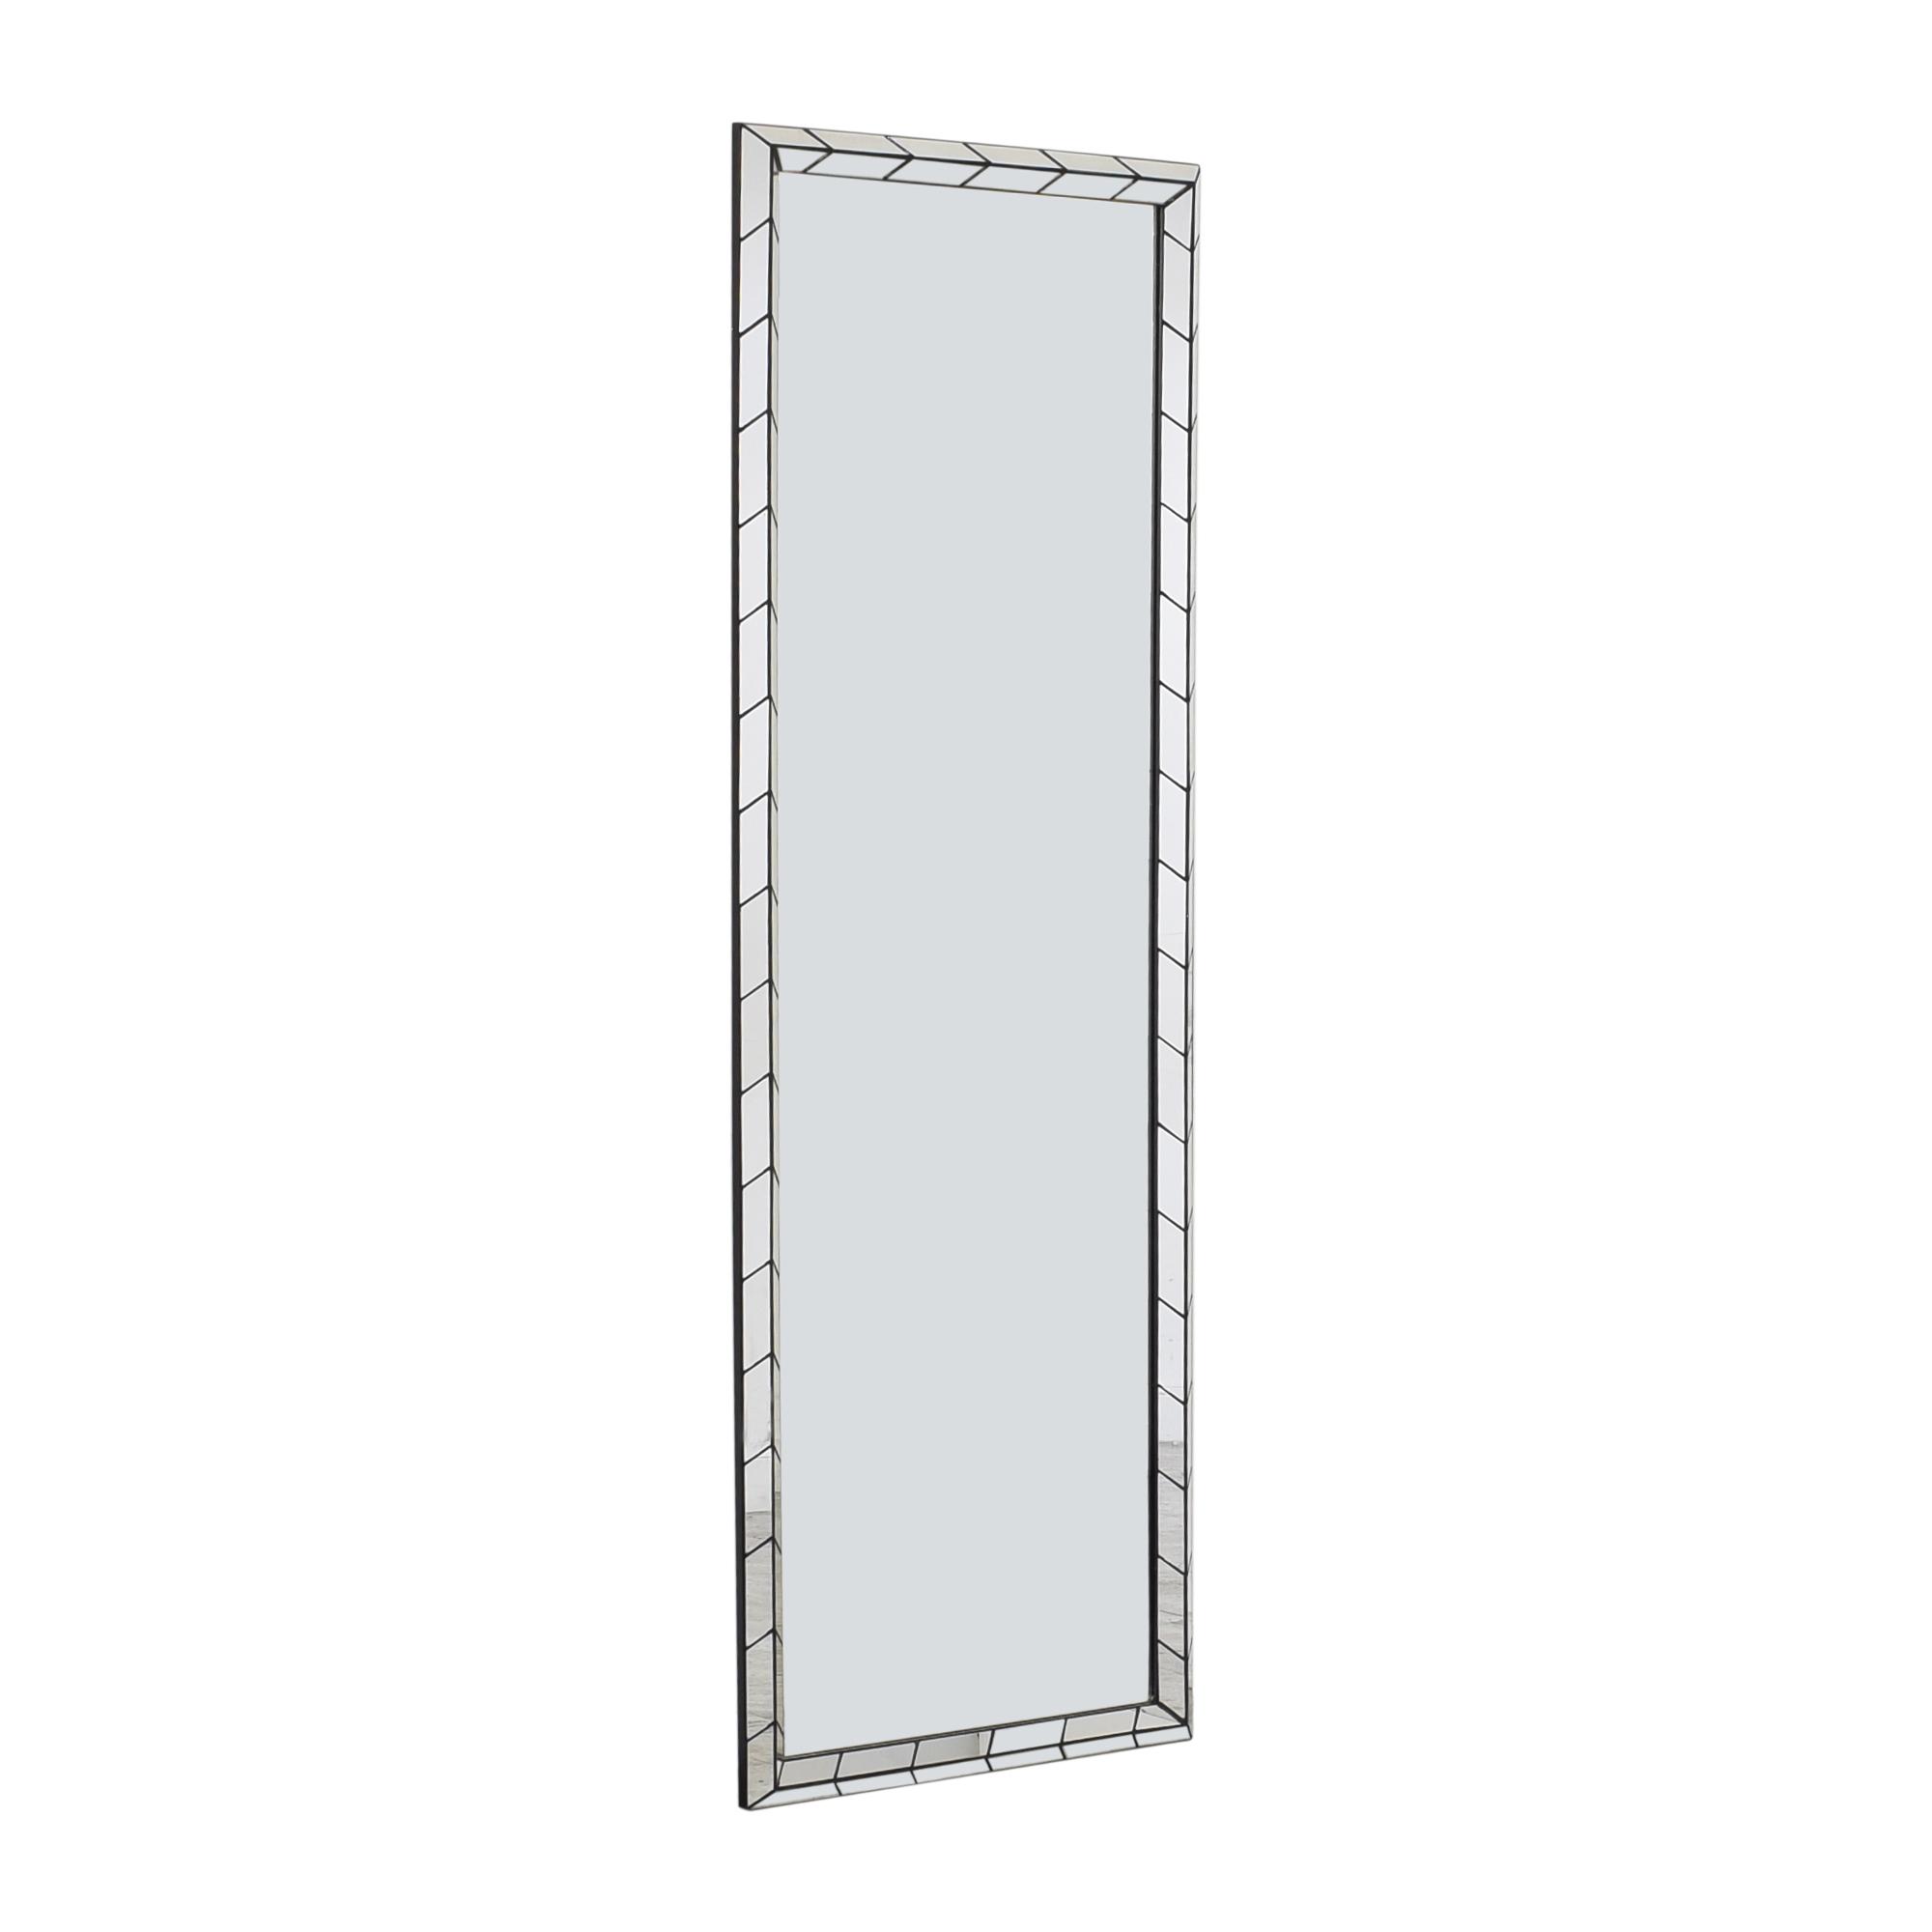 buy West Elm Chevron Tile Floor Mirrors West Elm